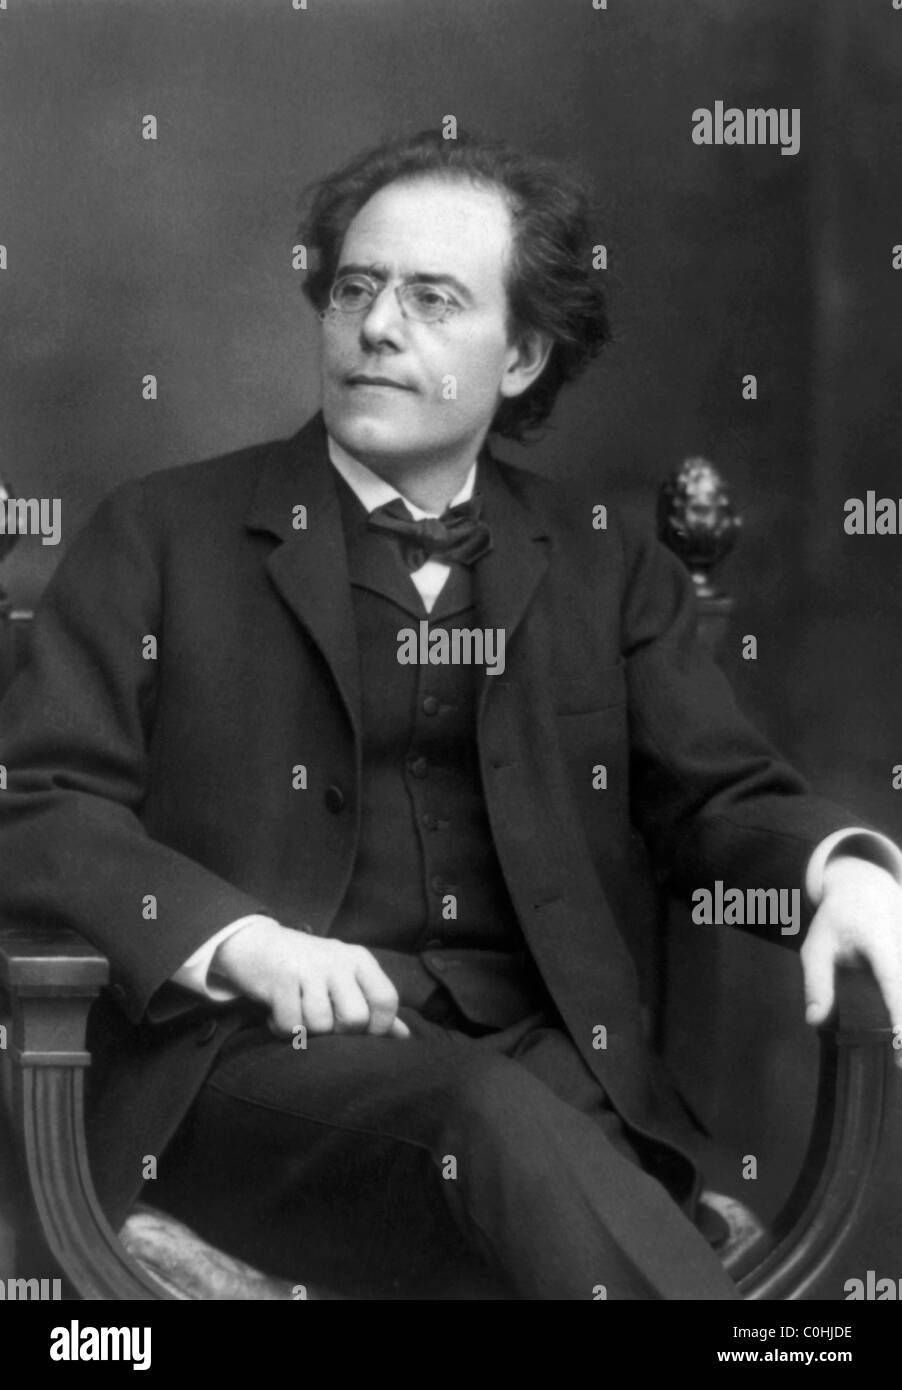 Vintage portrait photo circa 1909 of Austrian composer and conductor Gustav Mahler (1860 - 1911). Stock Photo